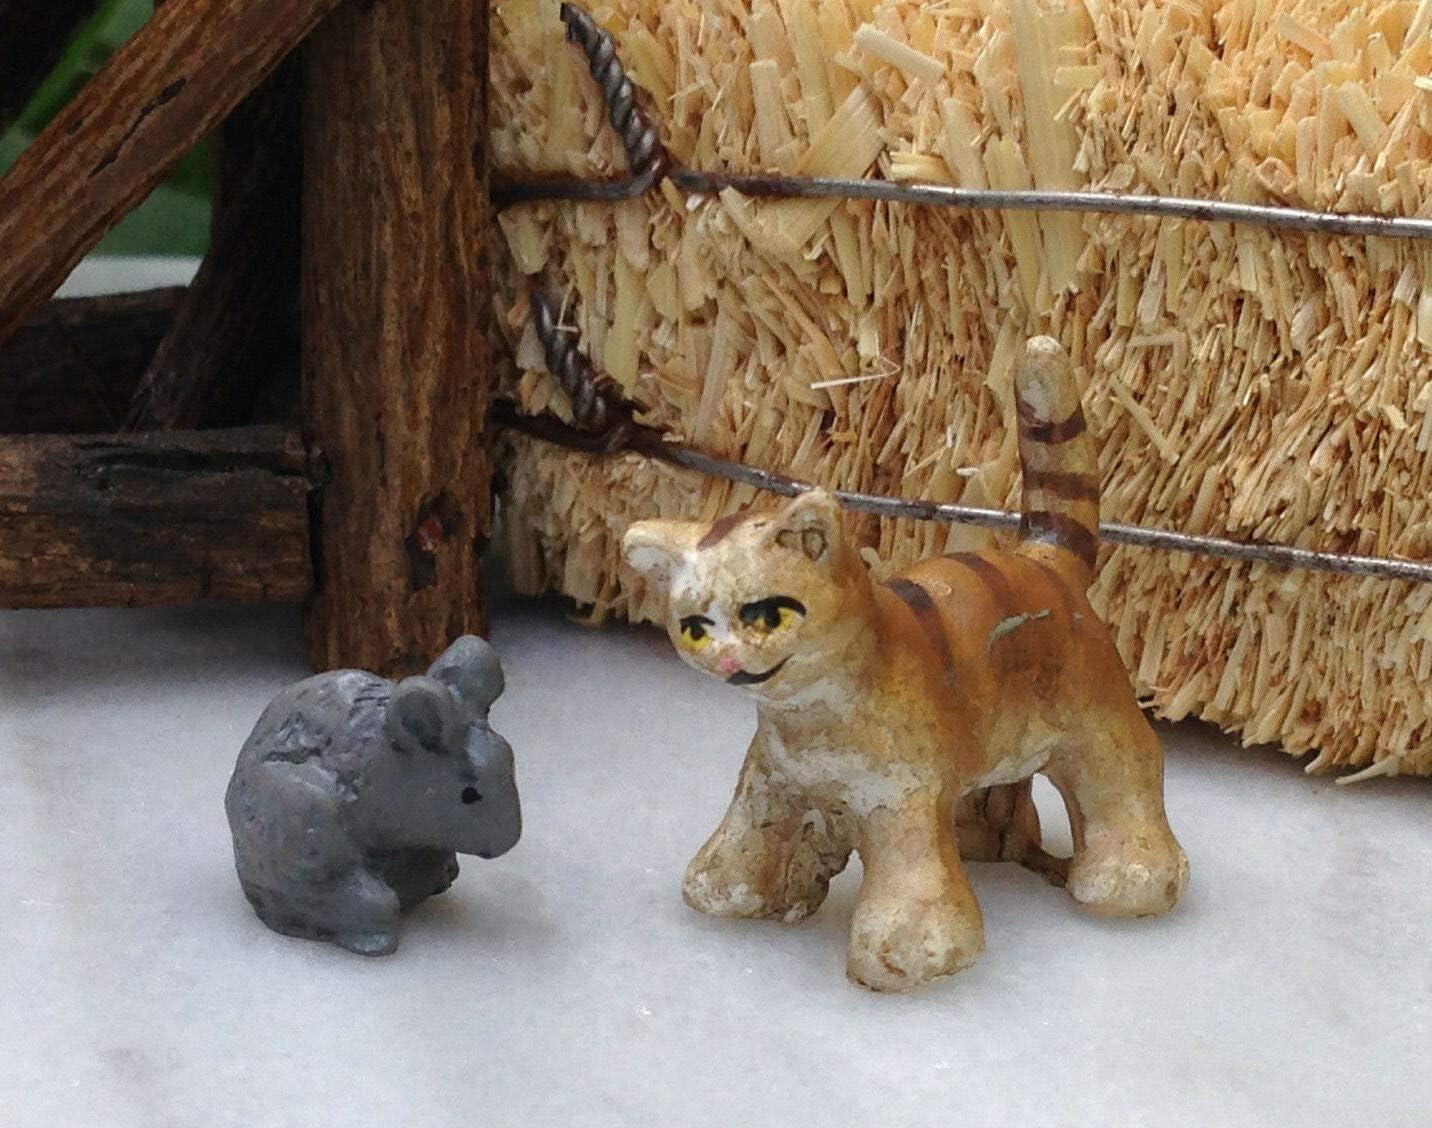 Miniature Dollhouse Fairy Garden Accessories Tiny Tabby Cat & Gray Mouse